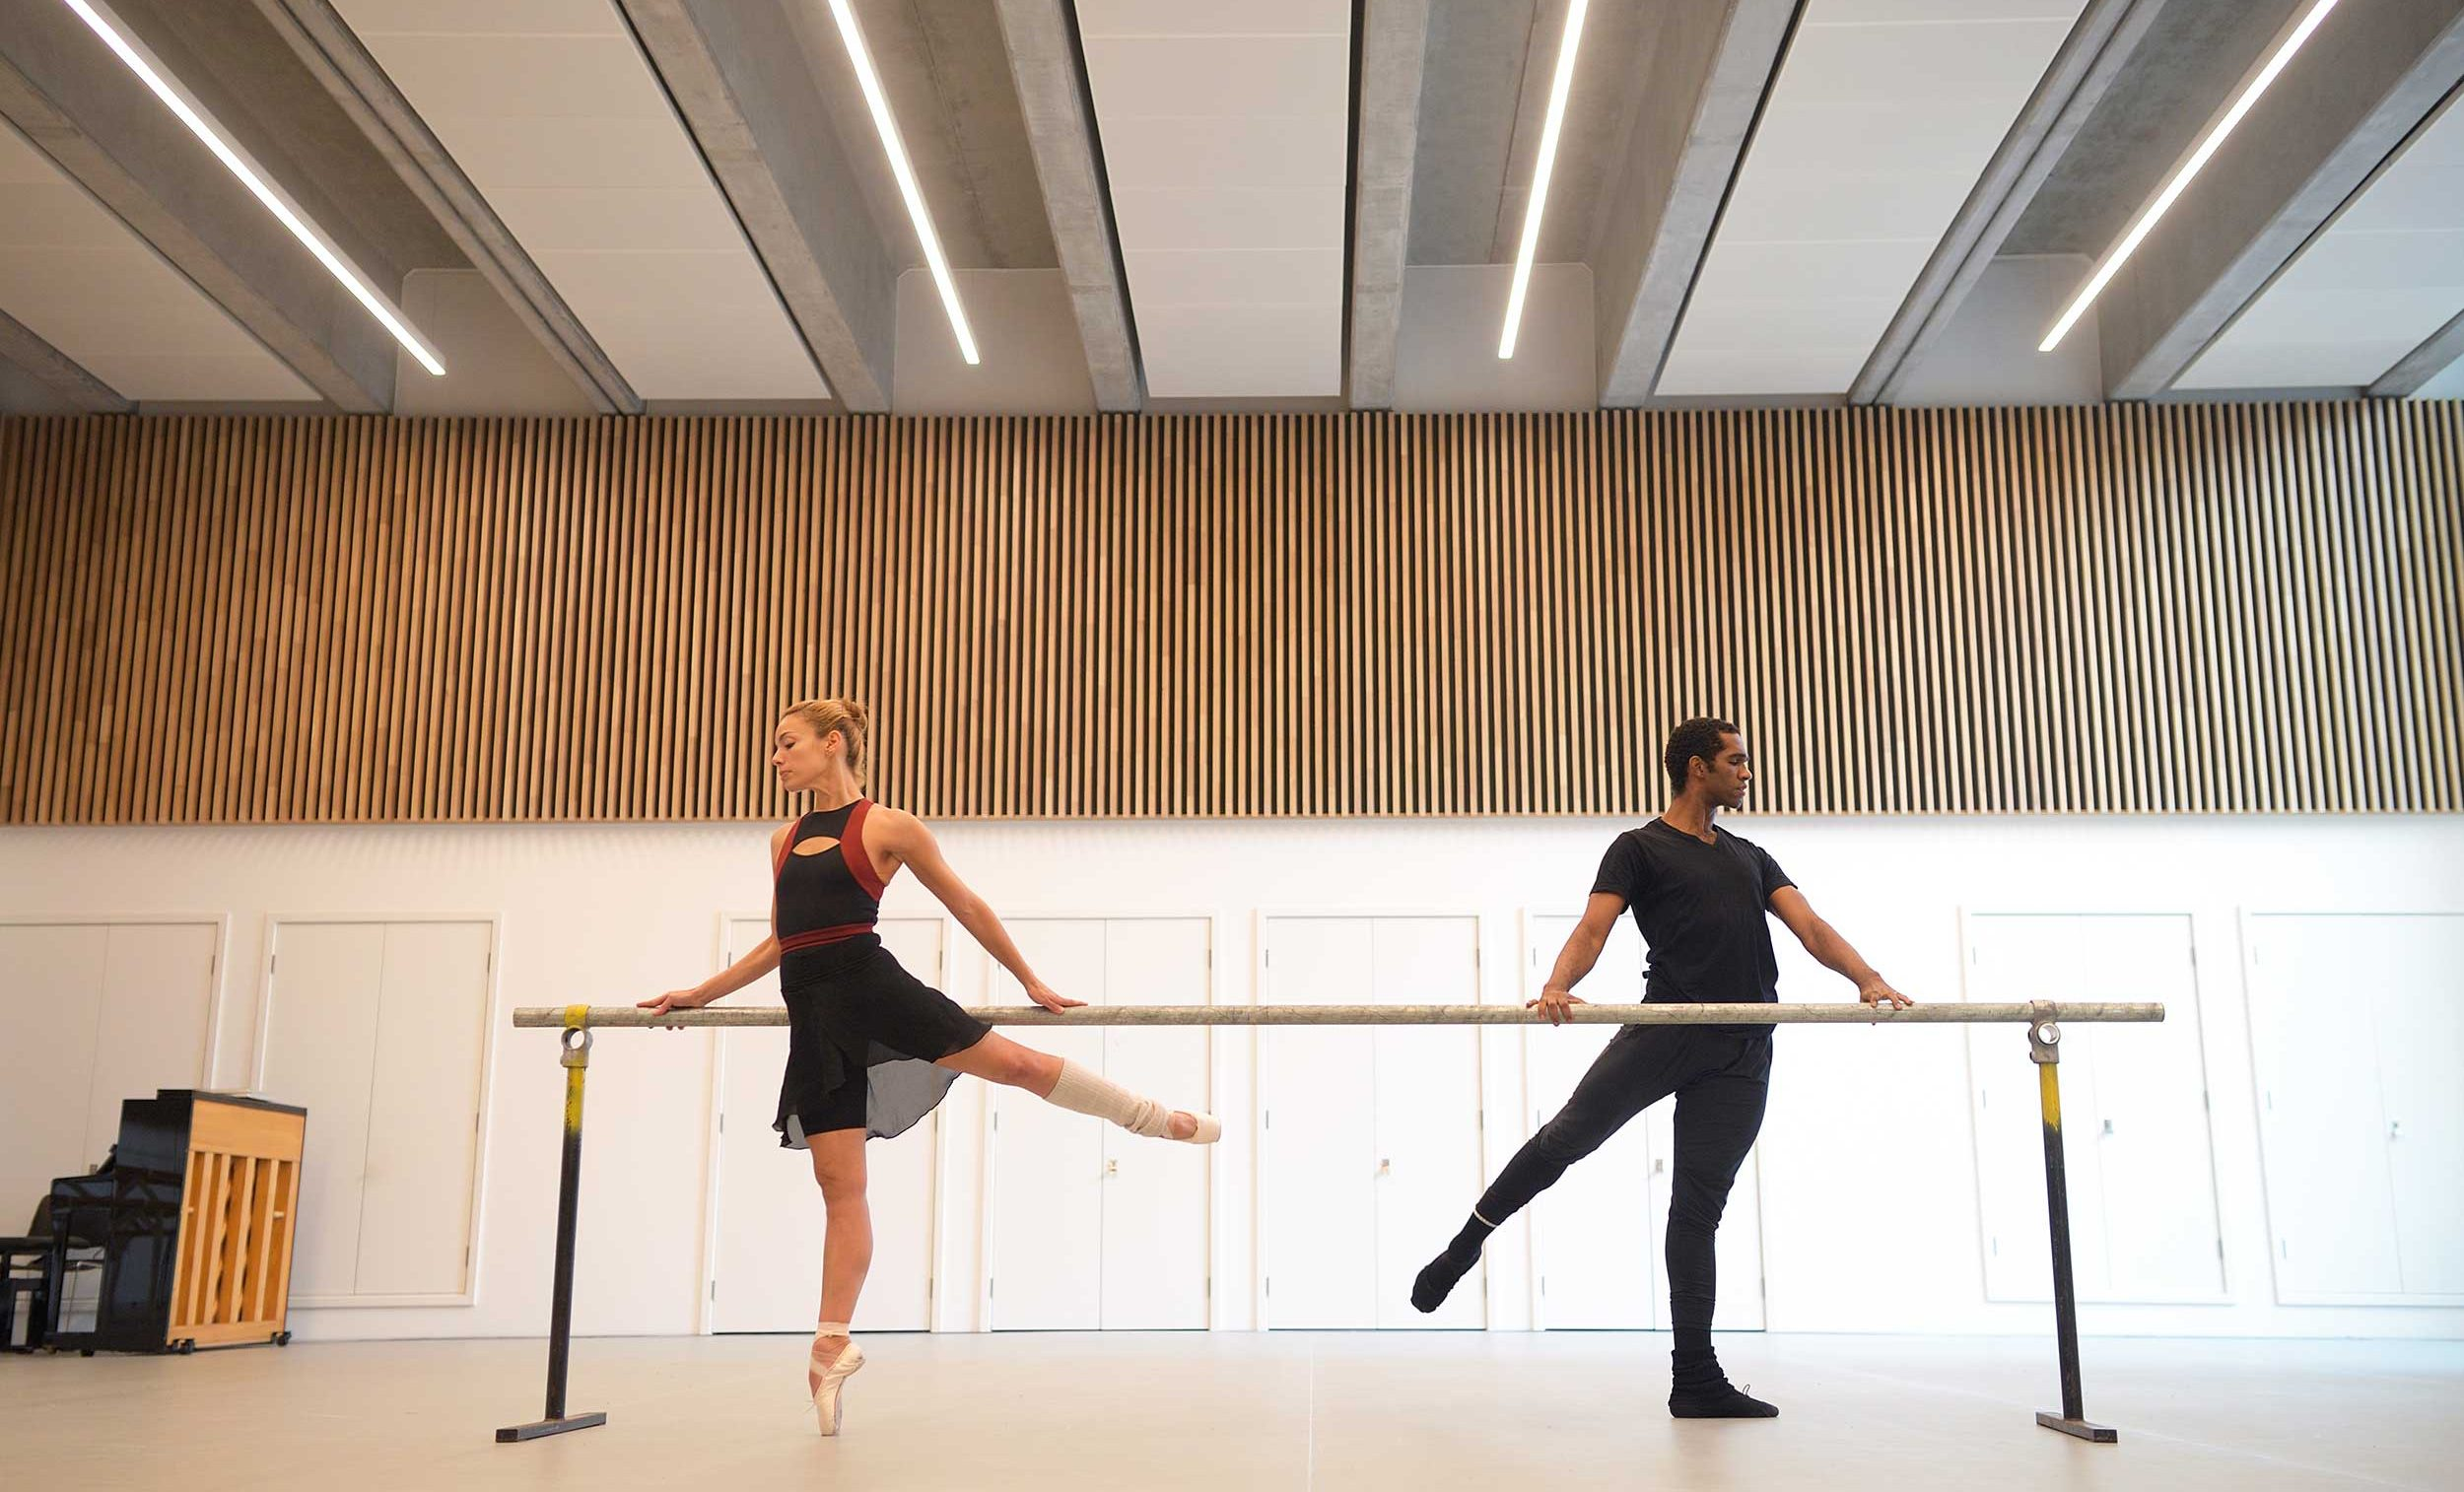 Fernanda-Oliviera-and-Junor-Souza-rehearse-Ben-Stevenson's-Three-Preludes-ahead-of-ENB's-70th-Anniversary-Galas-(C)-Laurent-L-(3)